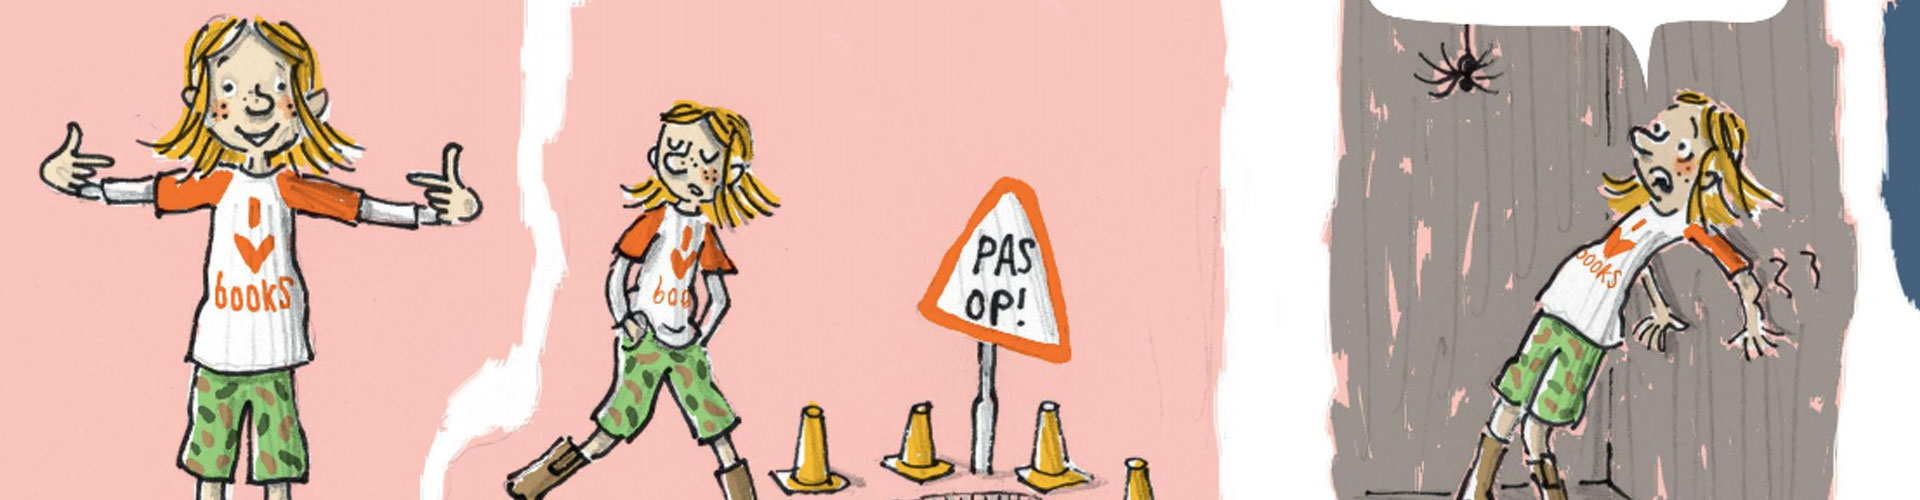 Hoe-maak-je-een-boek-Annemarie-Bon-Marja-Meijer